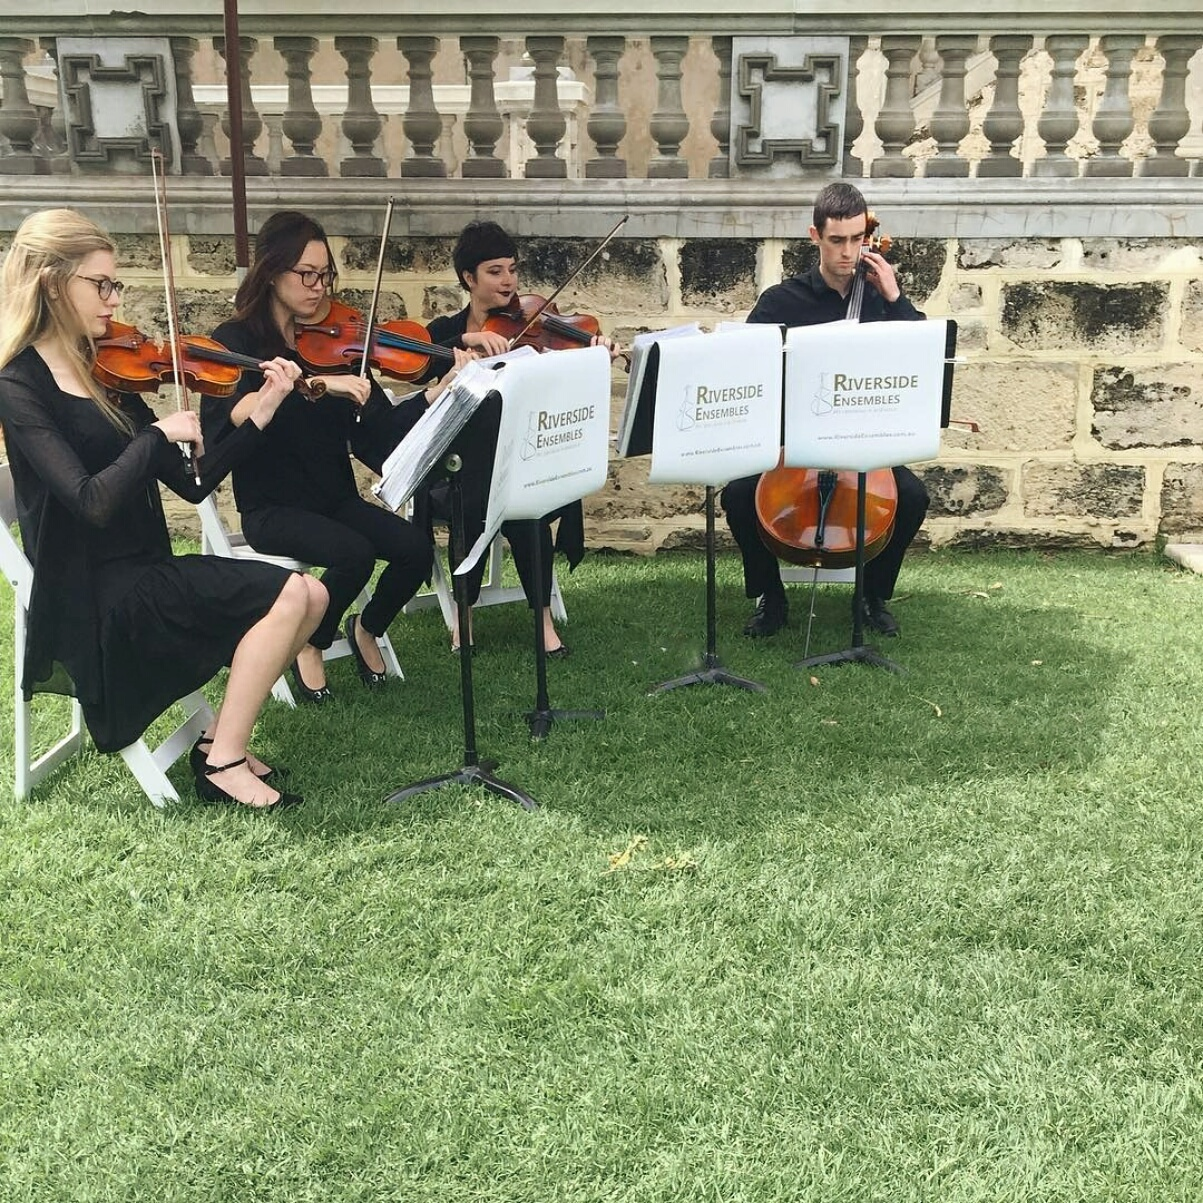 perth-function-string-music-hire-wedding-riverside-musiciansperth-function-string-music-hire-wedding-riverside-musicians-quartet-cottesloe-civic-violin-violinist-viola-cello